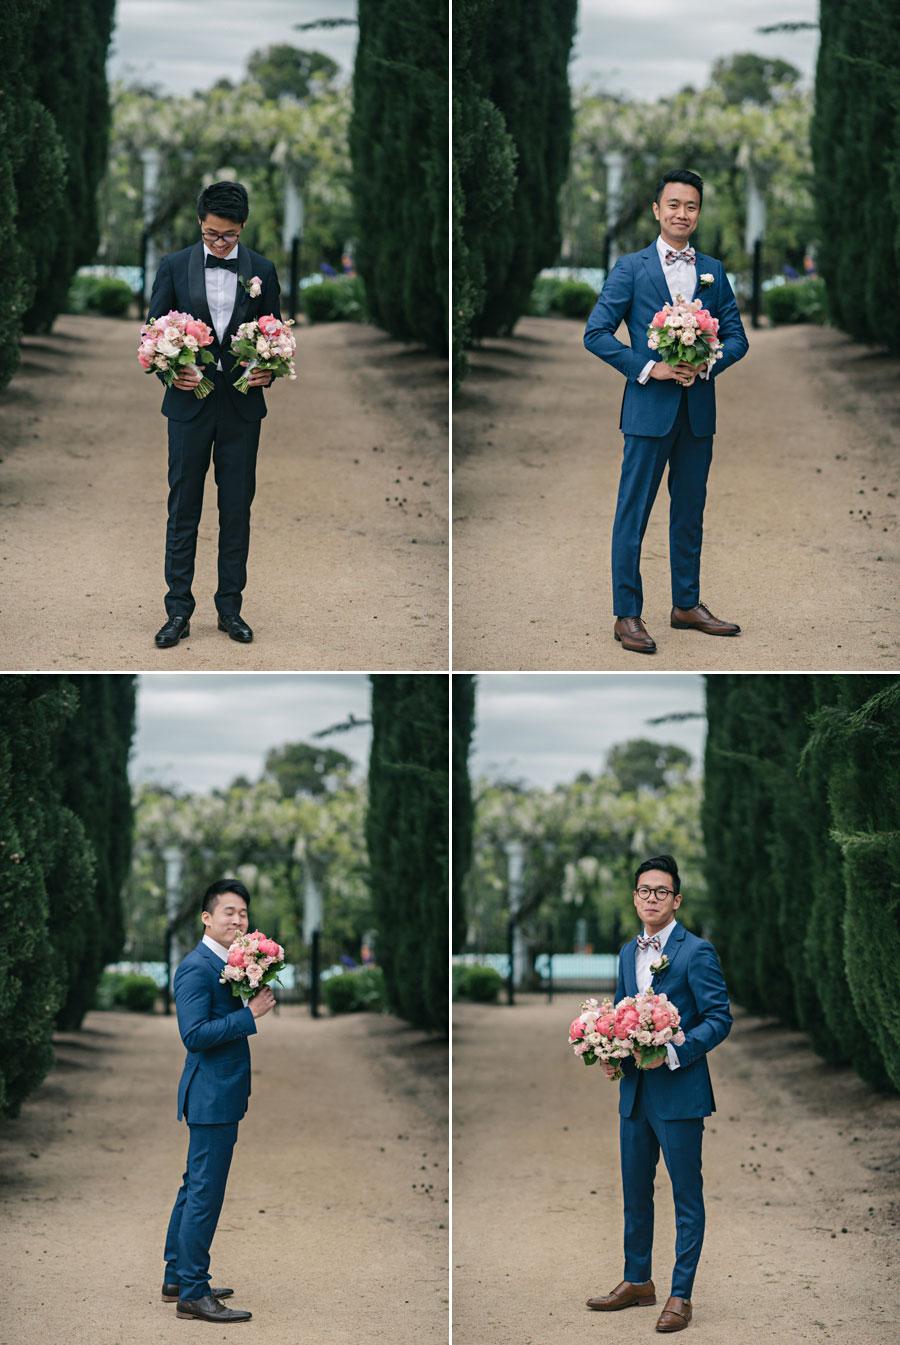 wedding-photography-coombe-yarra-valley-bella-emerson-087.jpg